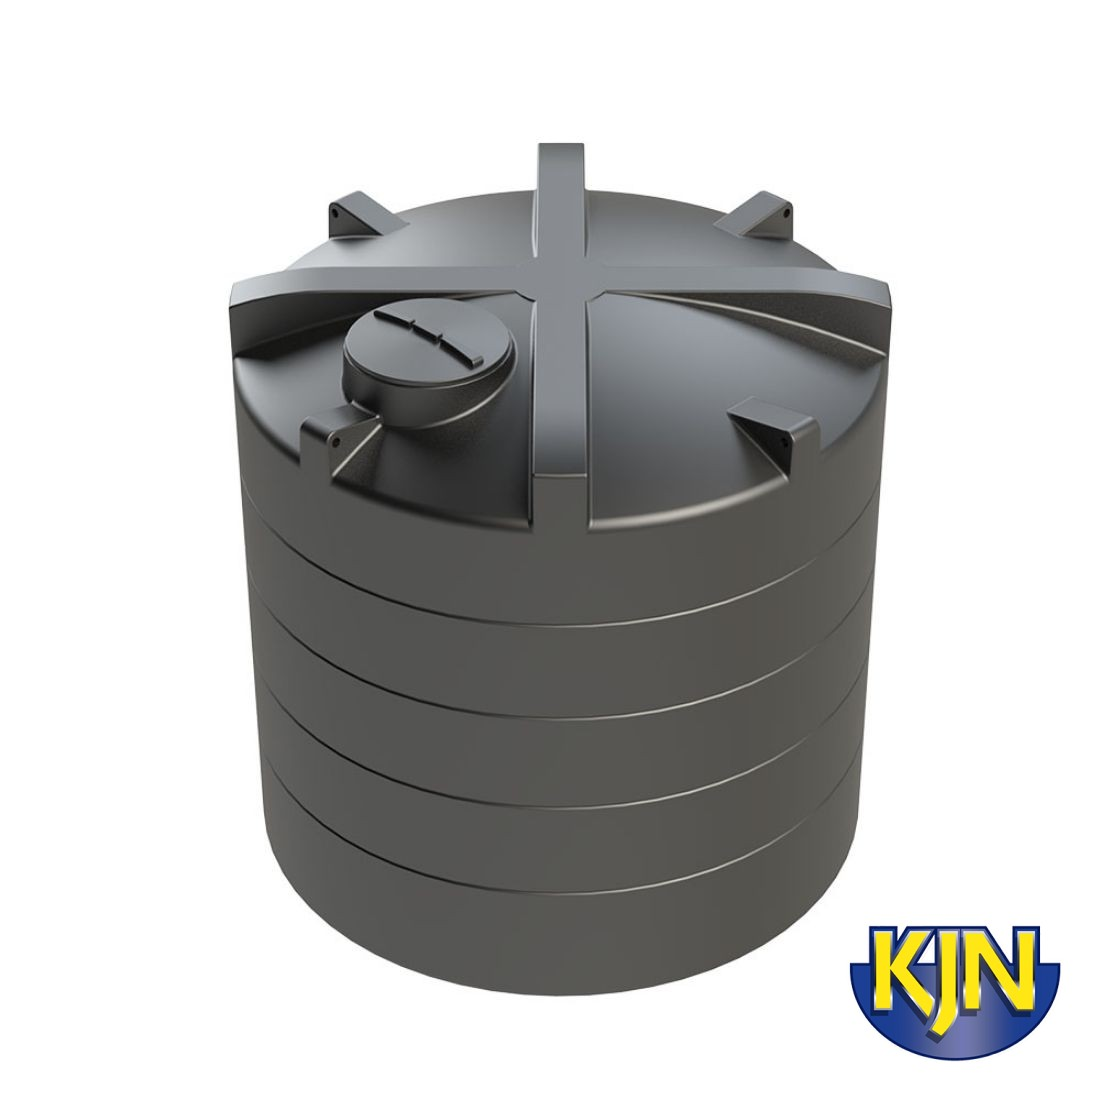 Enduramaxx 12,500 Litre Vertical Potable WRAS Water Storage Tank